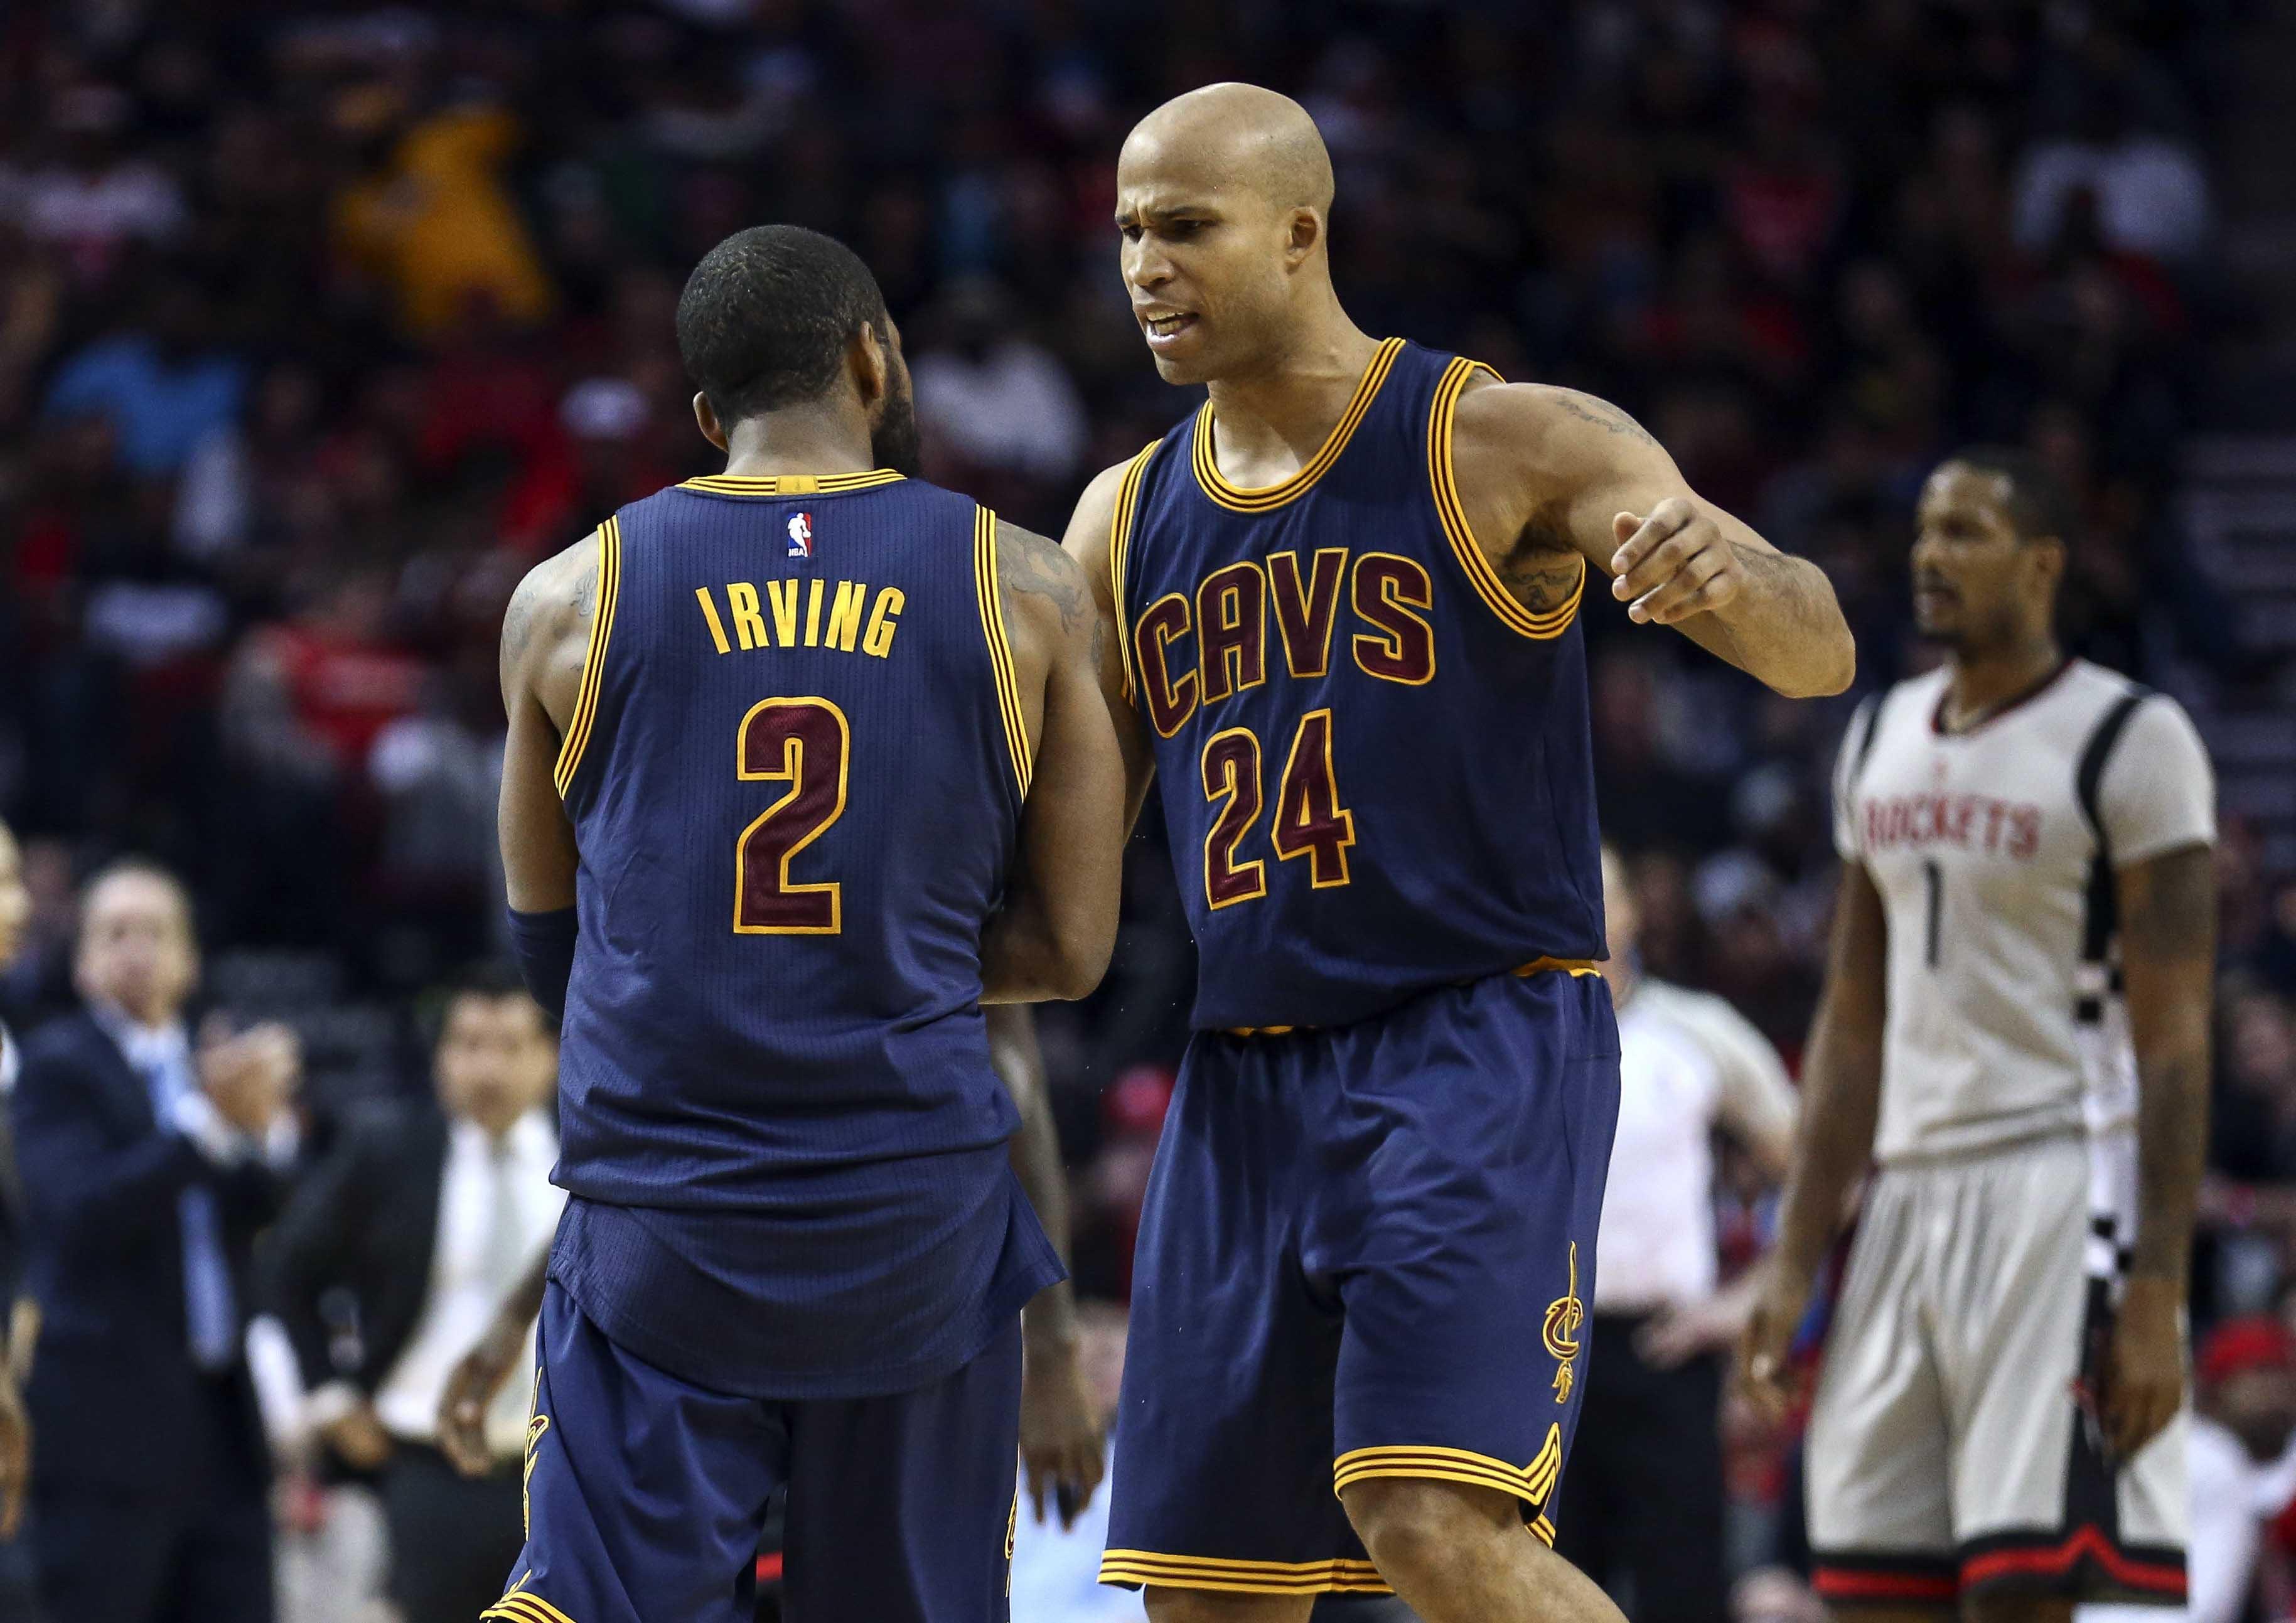 NBA: Cleveland Cavaliers at Houston Rockets